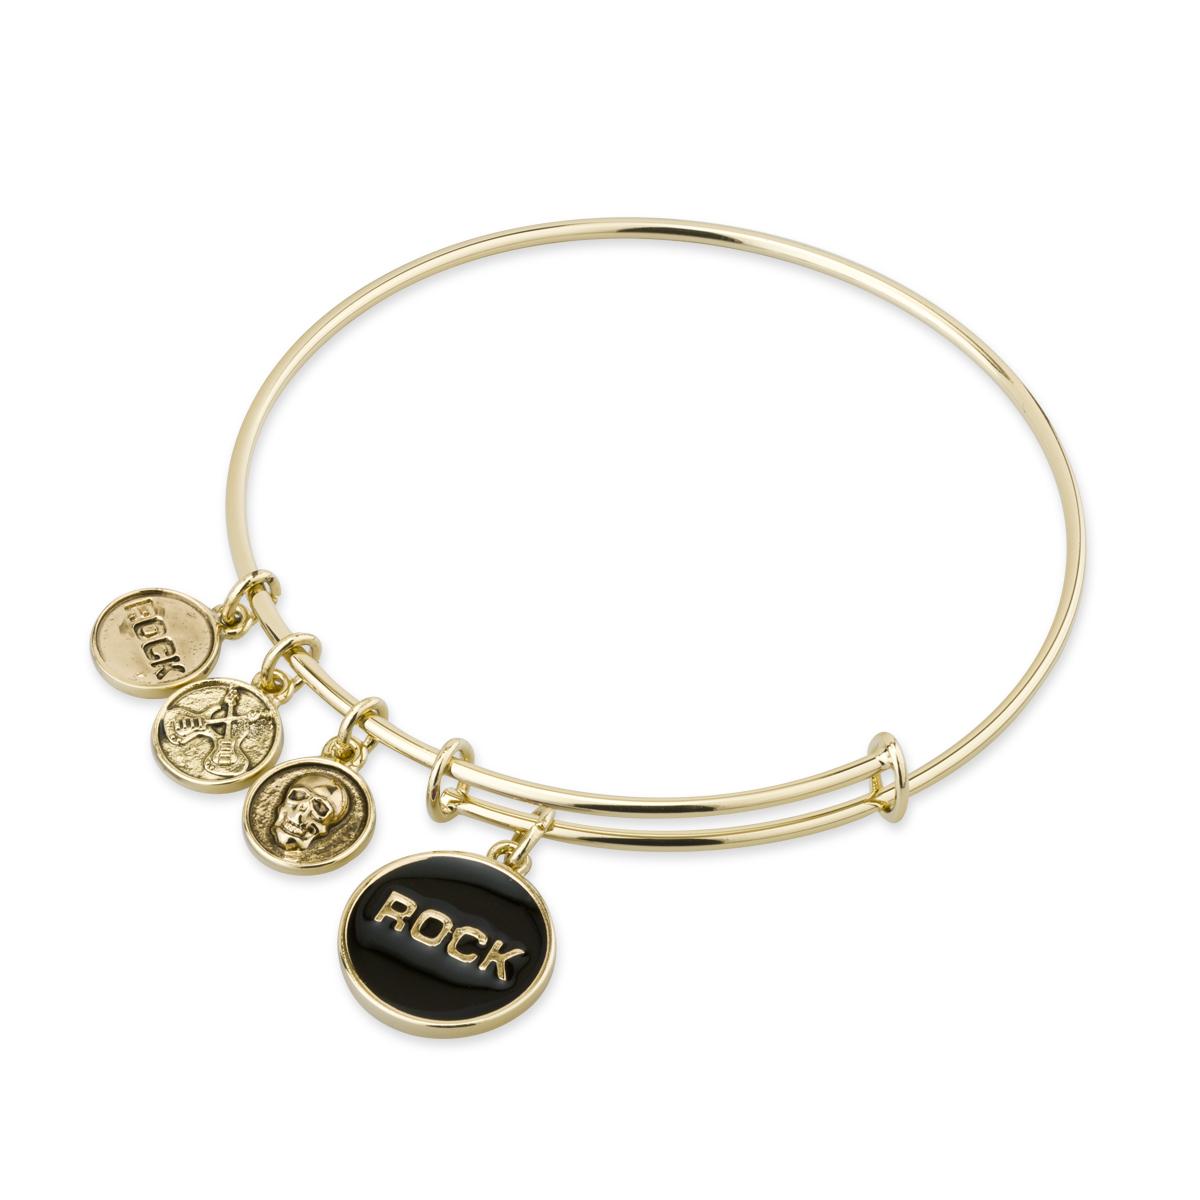 Gold Bangle Bracelet With Black Enamel Rock Charm